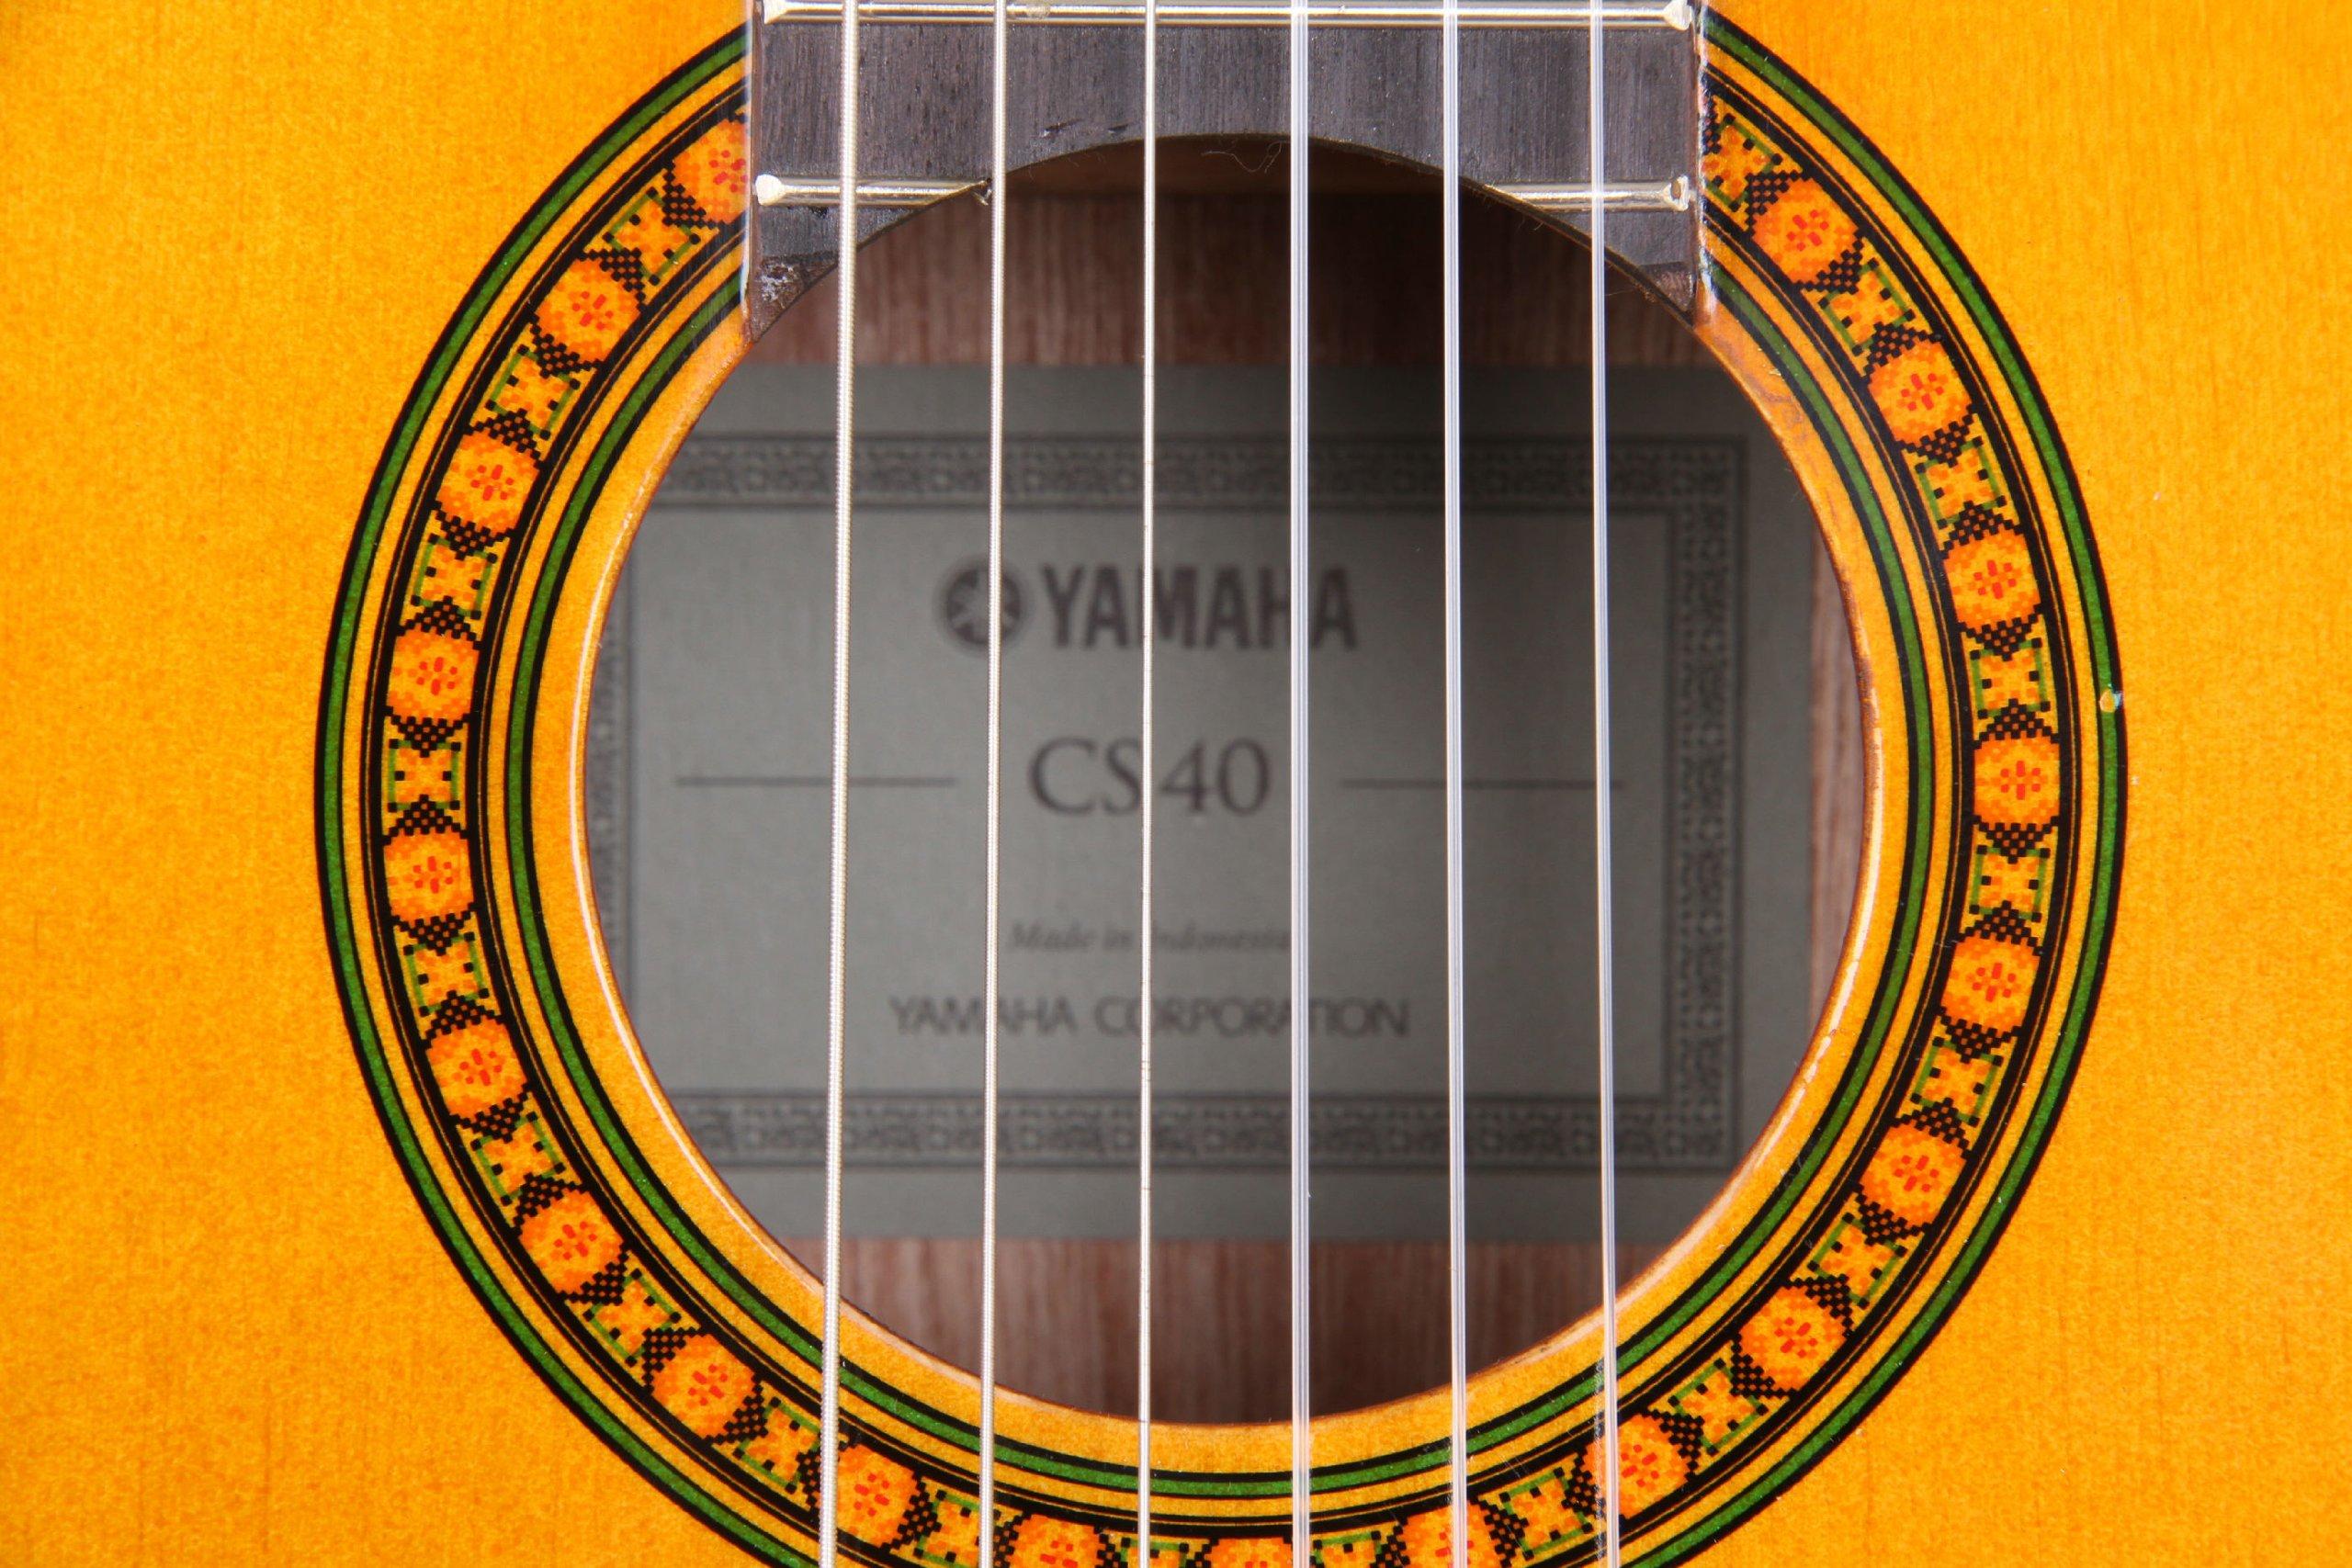 Yamaha CS40II Chitarra Classica 3/4, Chitarra in Legno (58 cm, scala da 22 13/16″), 6 Corde in Nylon, Naturale